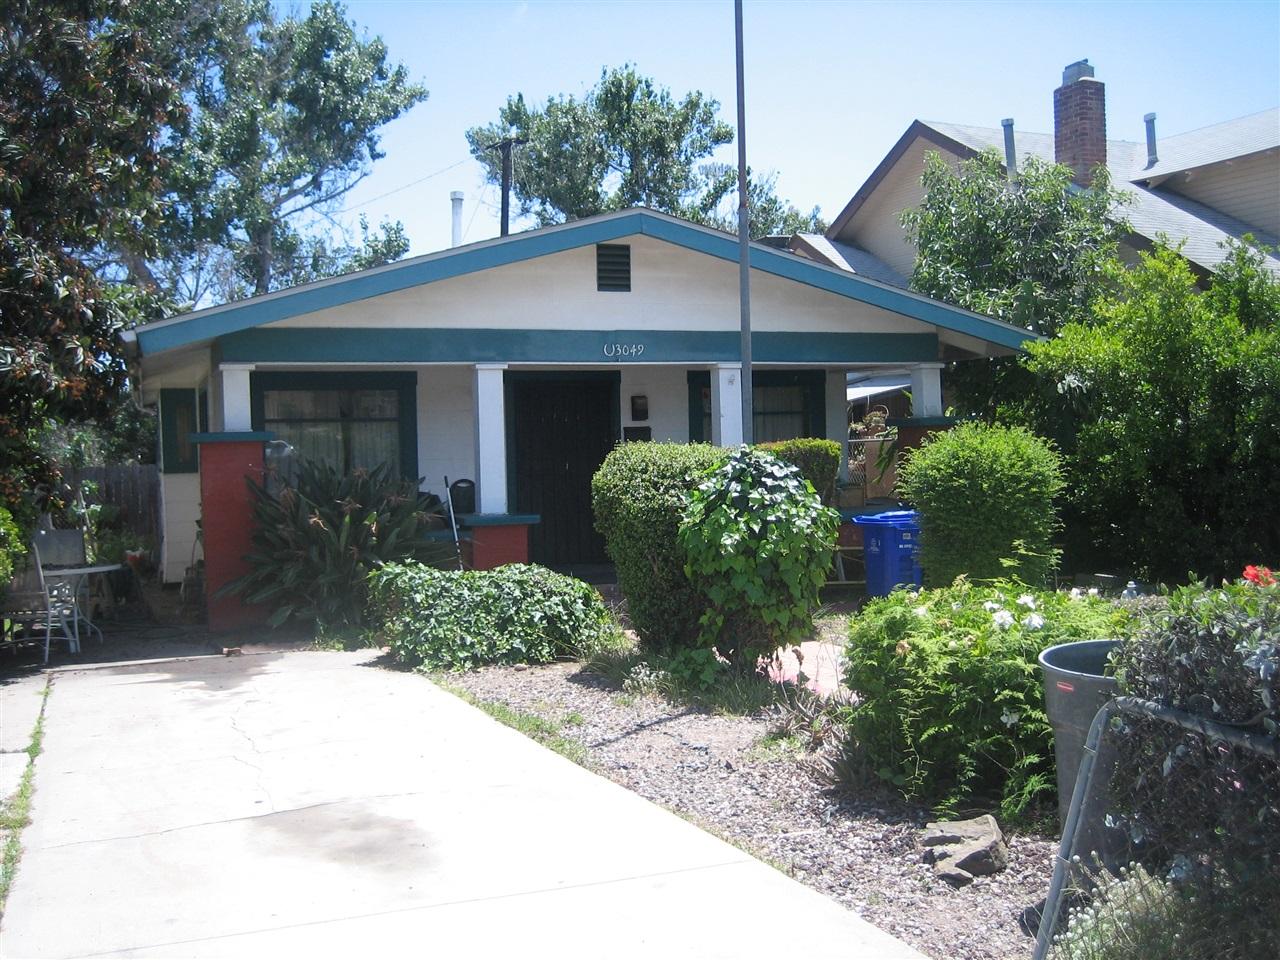 3049 E San, San Diego, CA 92102